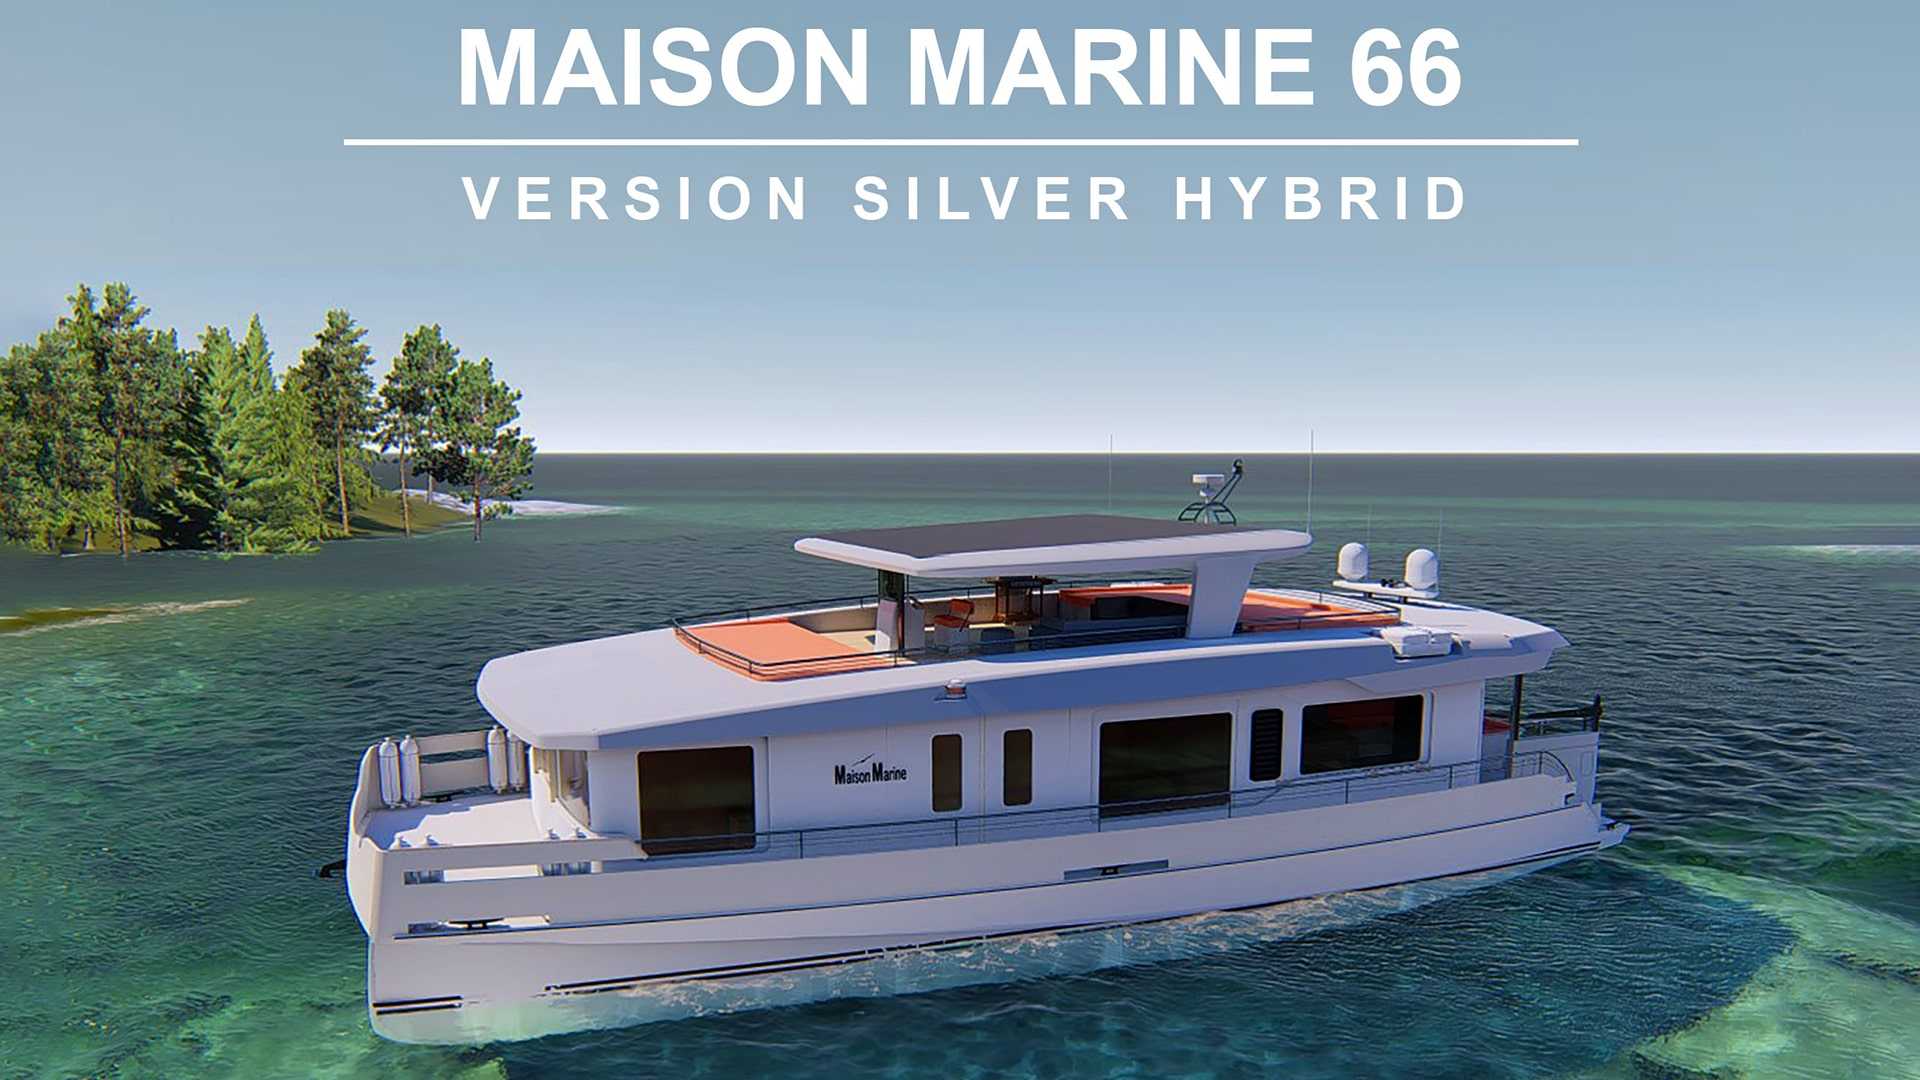 maison marine sylvers hybrid ok